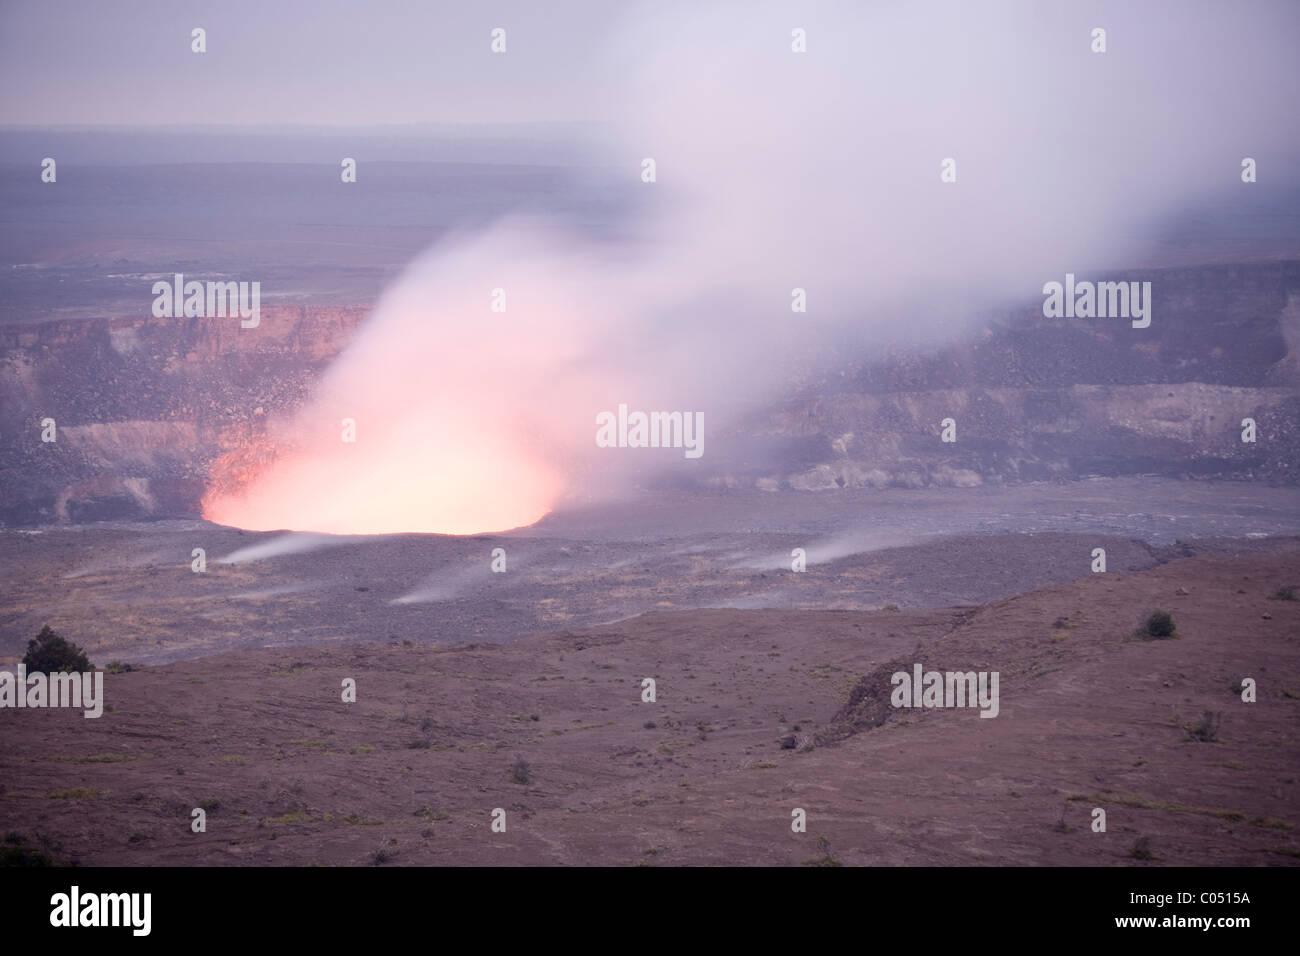 The lava filled Halema'uma'u Crater in Hawaii - Stock Image